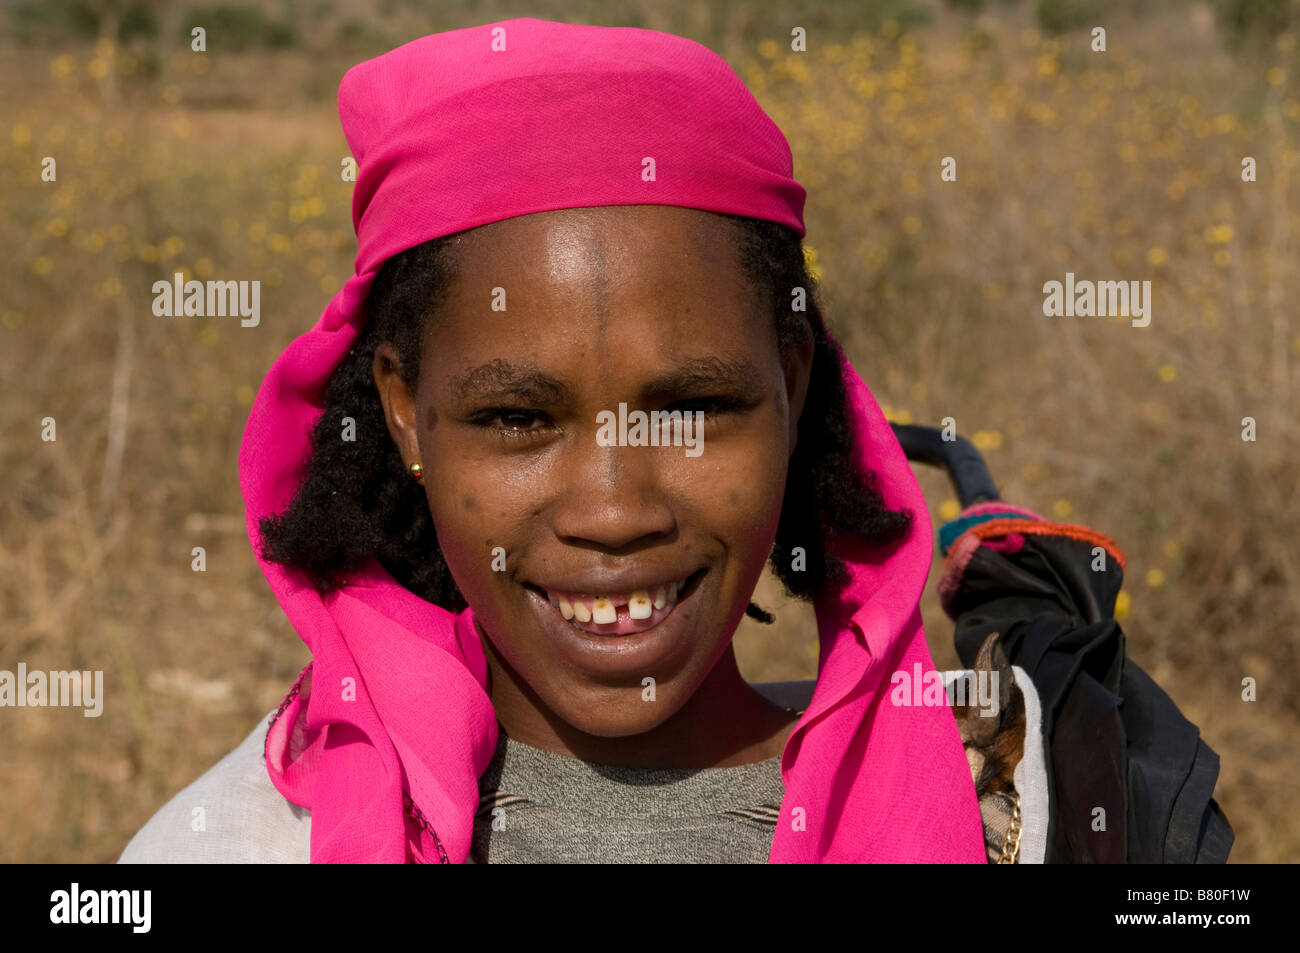 Girl from the Kori tribe smiling Nechisar National Park Ethiopia Africa Stock Photo